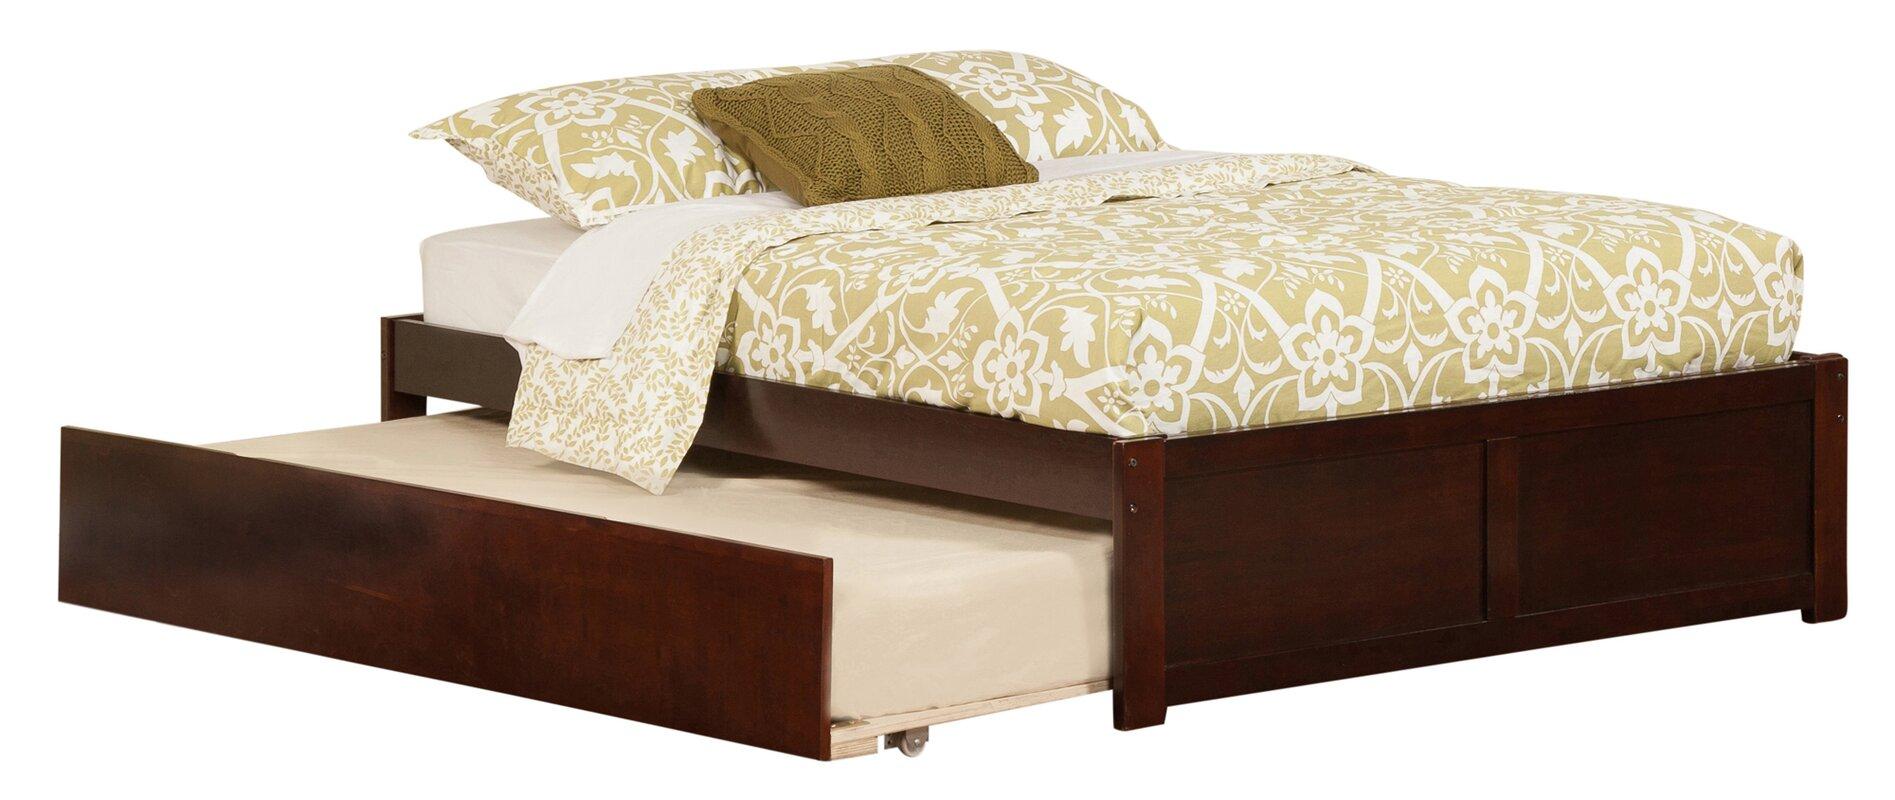 viv  rae greyson platform bed with trundle  reviews  wayfair - defaultname